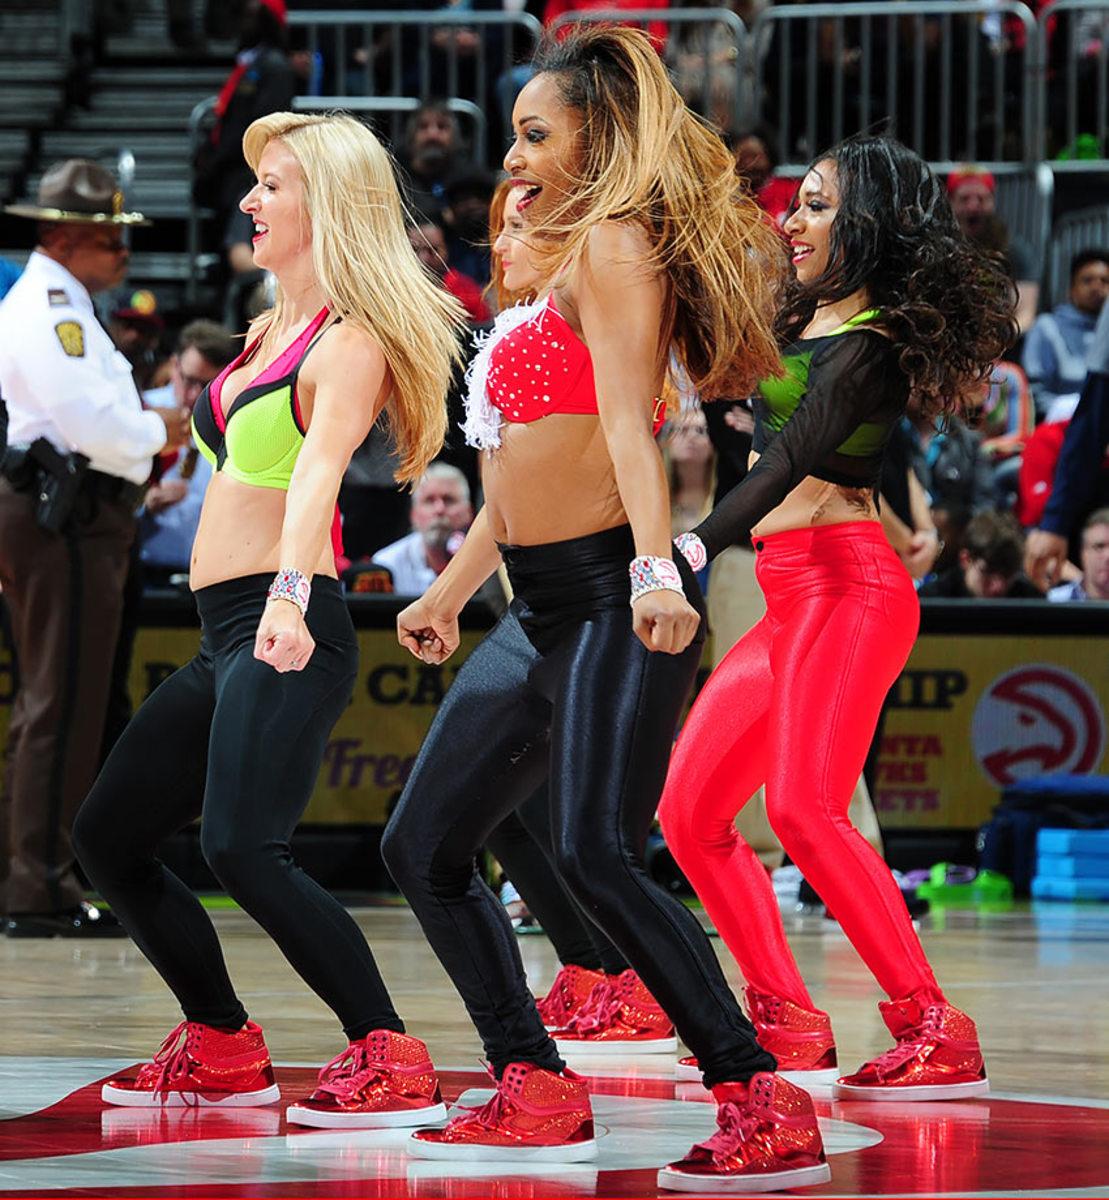 Atlanta-Hawks-Cheerleaders-507935002.jpg